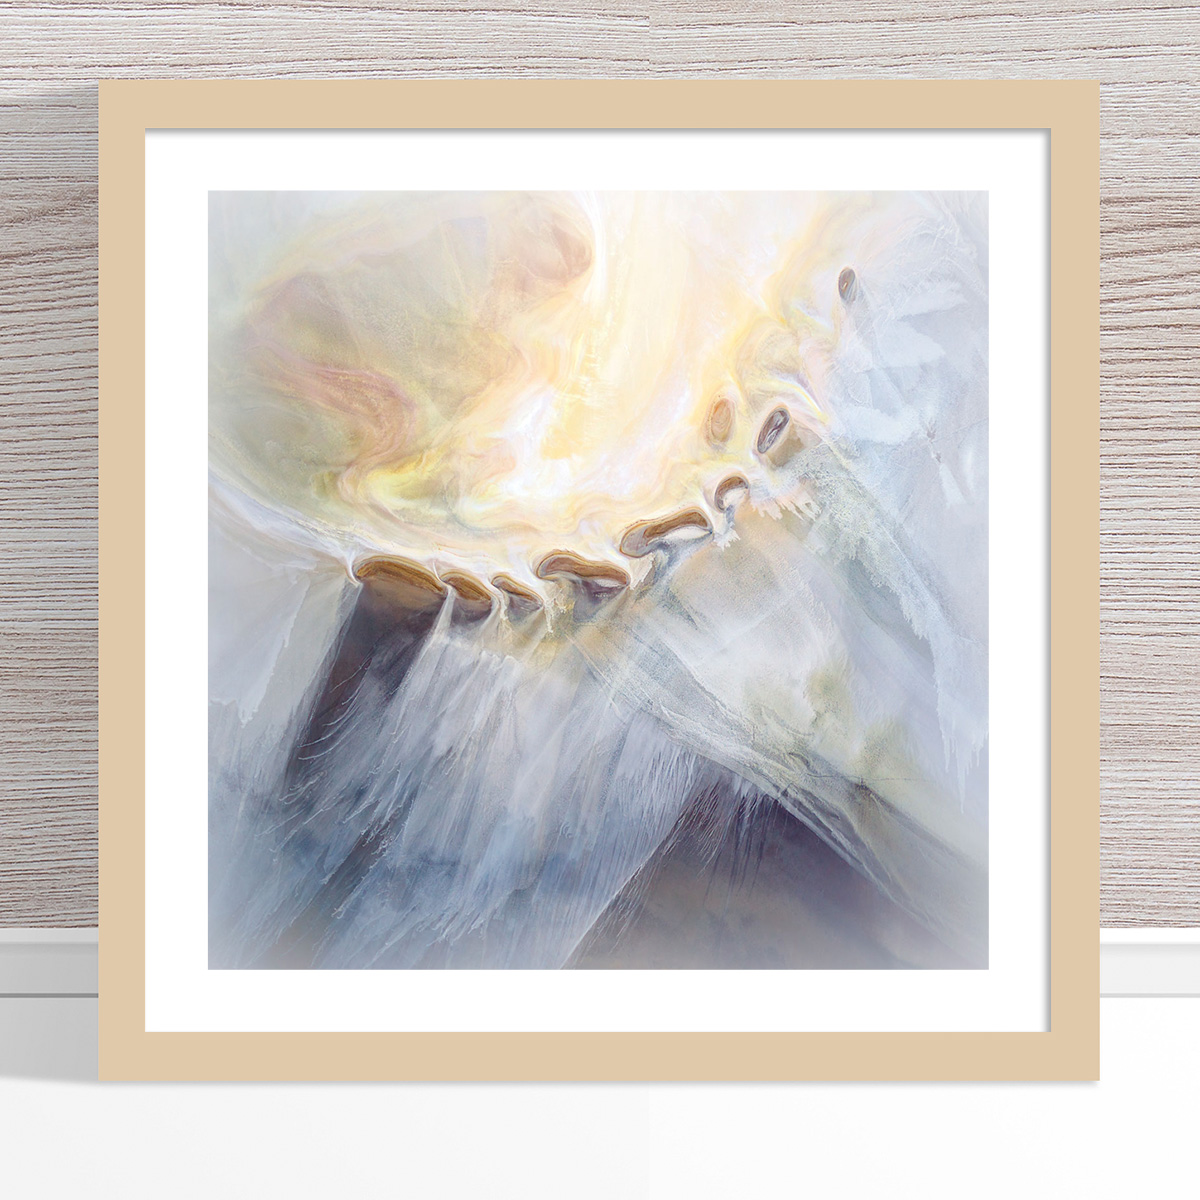 Chris Saunders - 'Aerial Salt 018' Light Frame